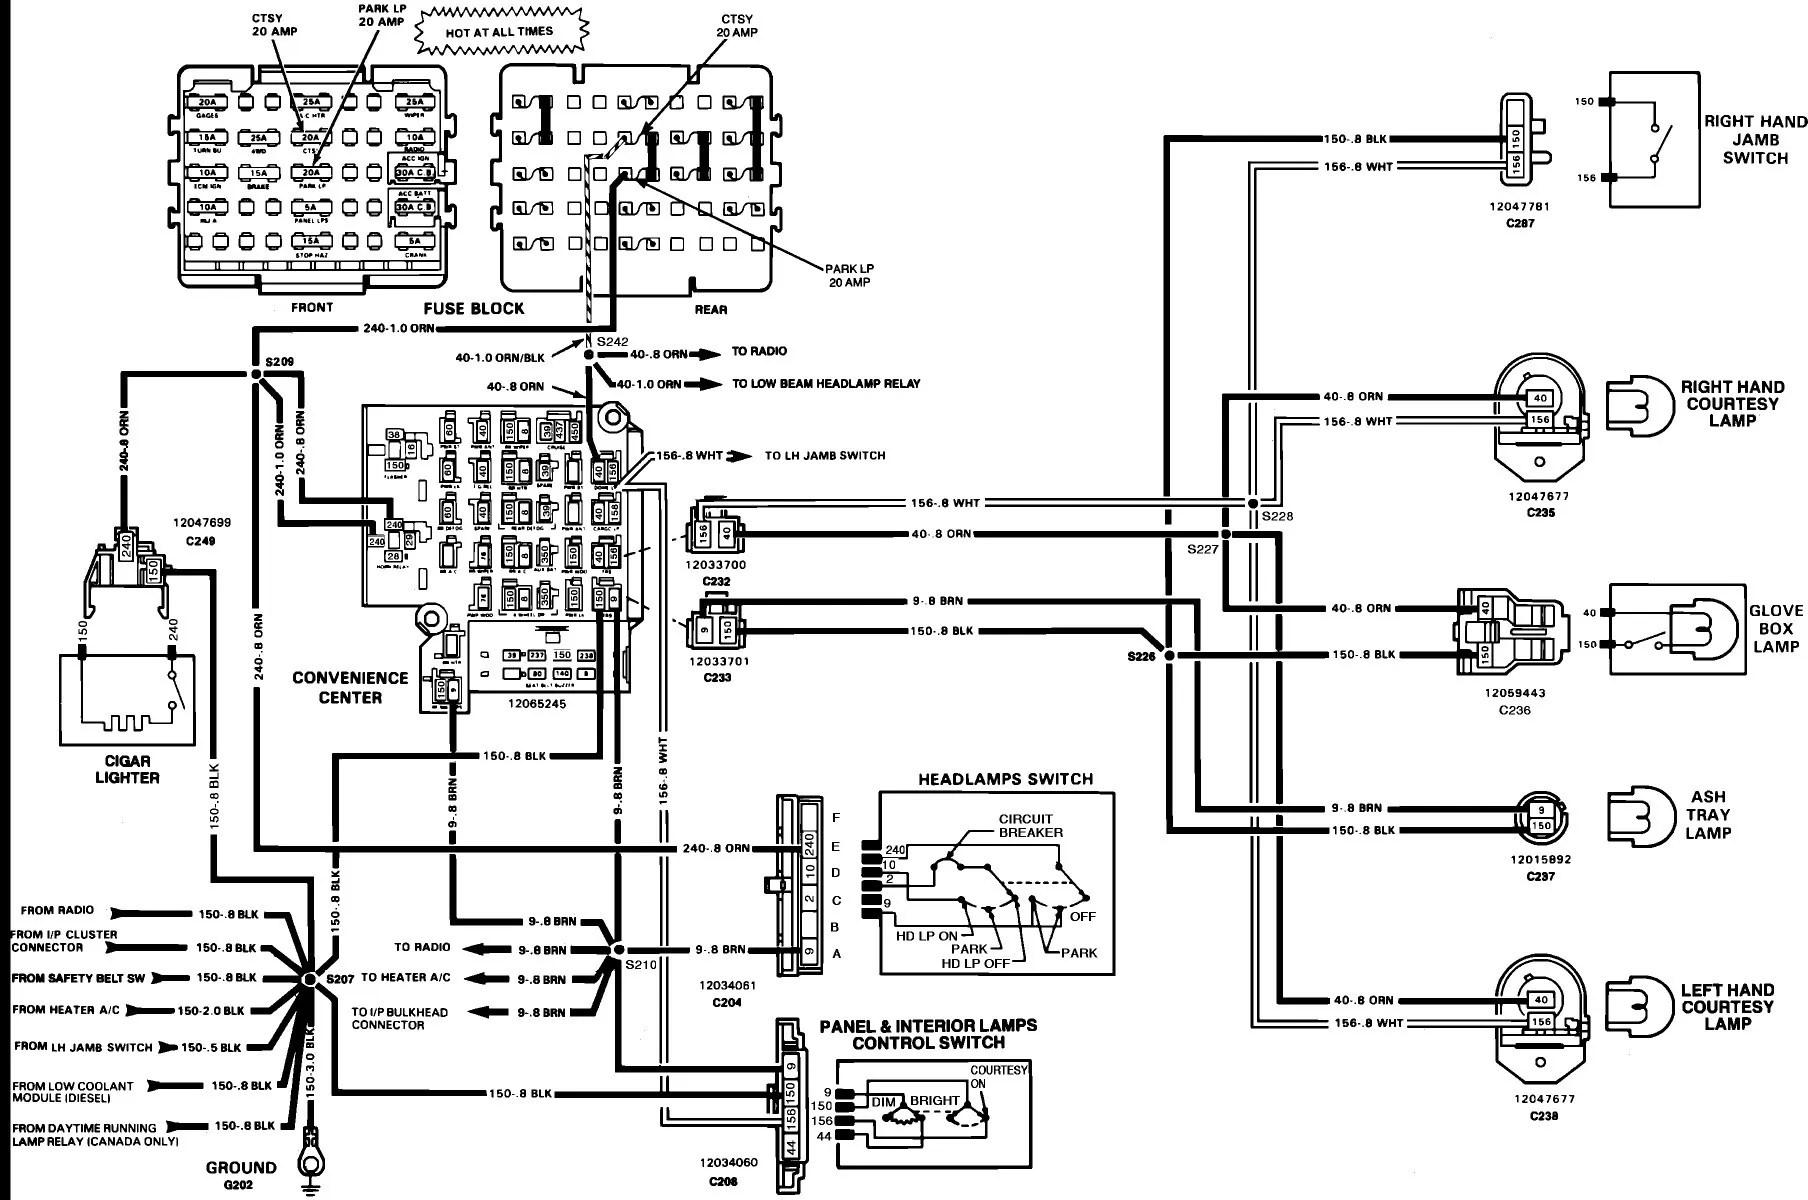 hight resolution of 88 98 chevy radio wiring diagram u2022 wiring diagram for free 98 chevy truck wiring diagram